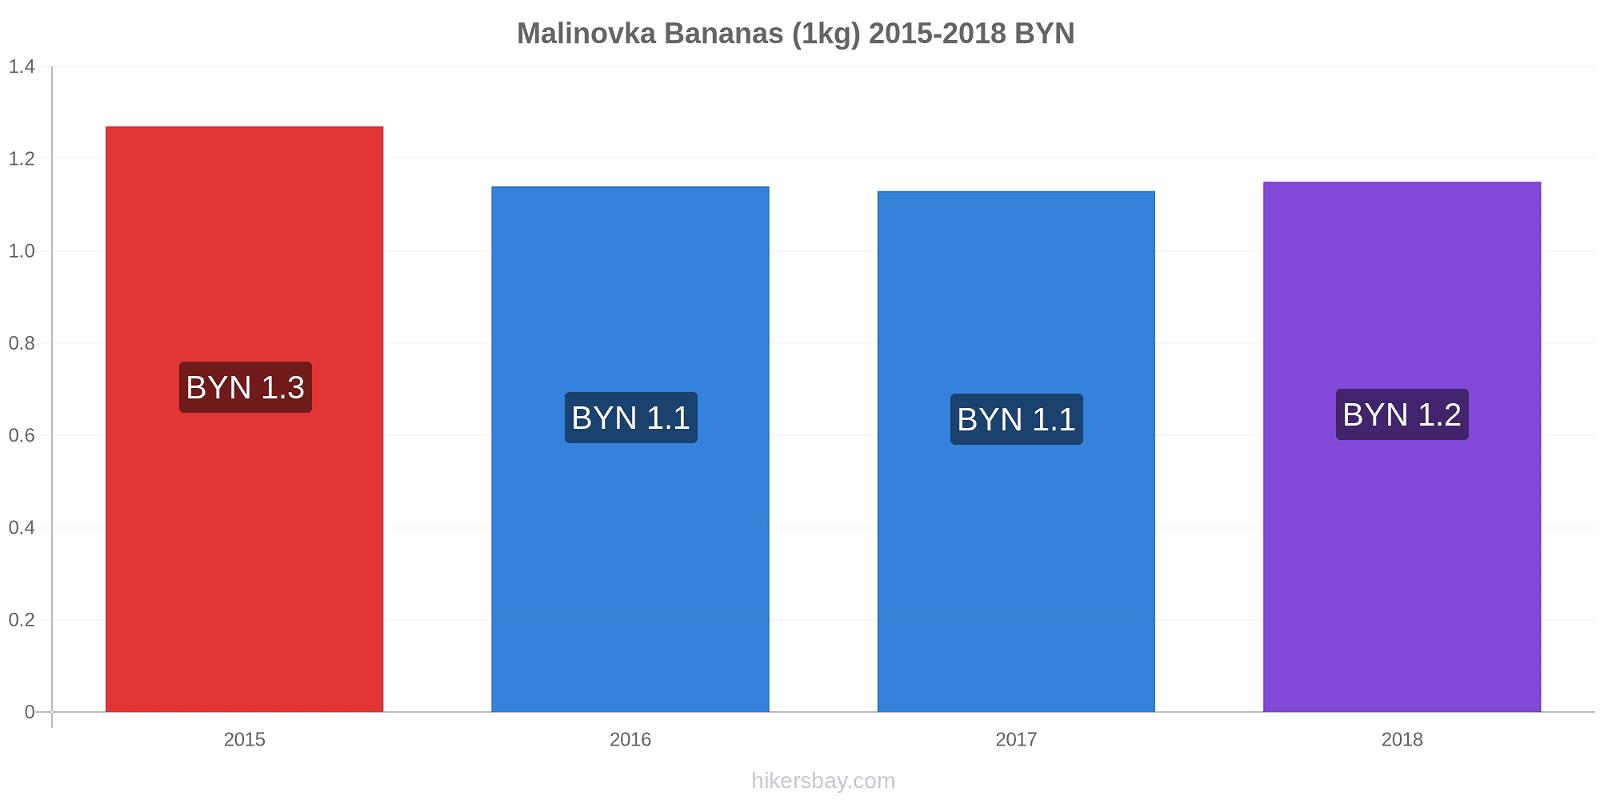 Malinovka price changes Bananas (1kg) hikersbay.com